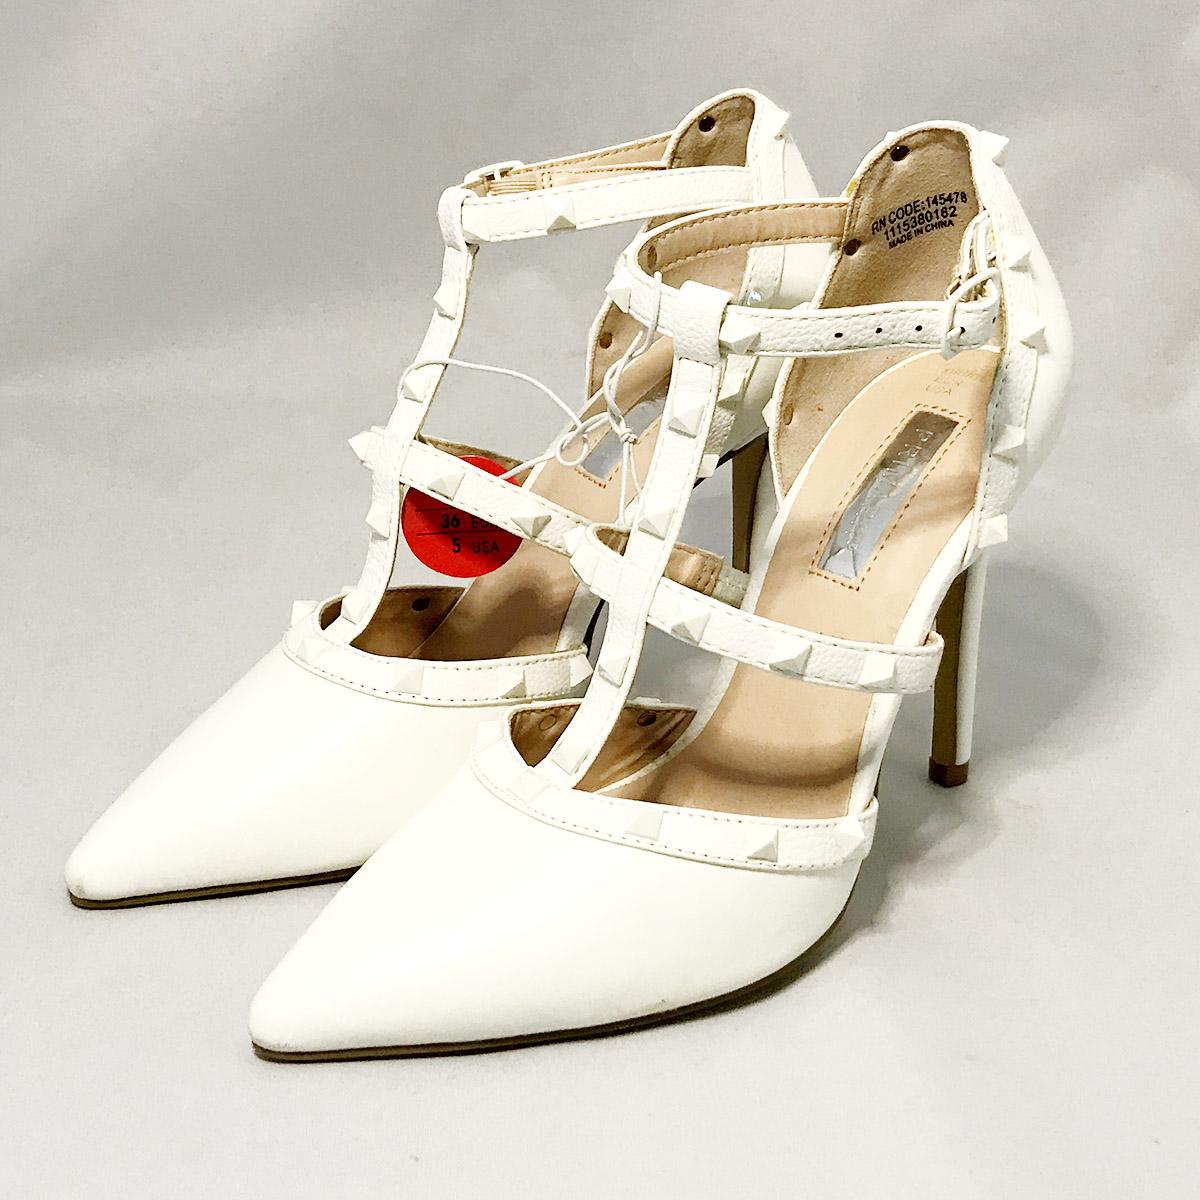 Primark White T-Bar Stiletto Heel Shoe